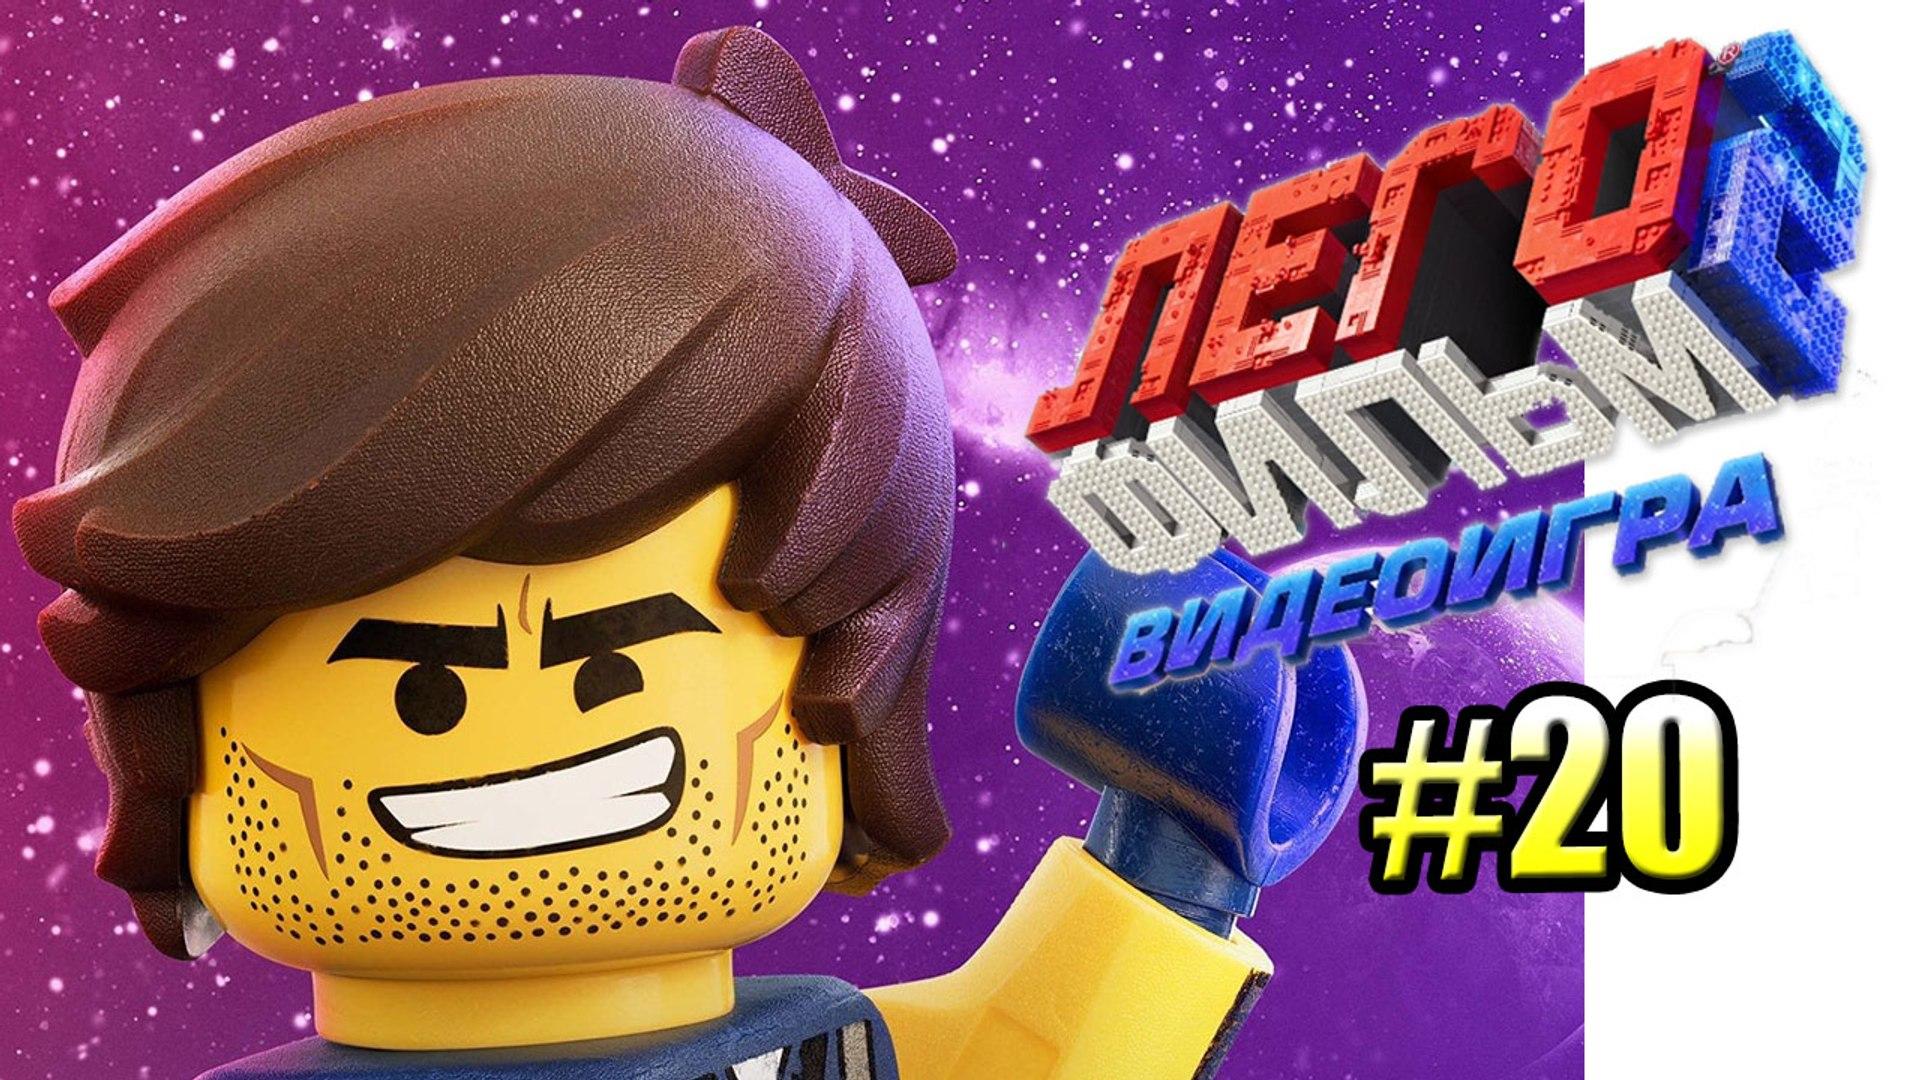 The LEGO Movie 2 Videogame прохождение #20 на русском {PC} Средьзеландия на 100%